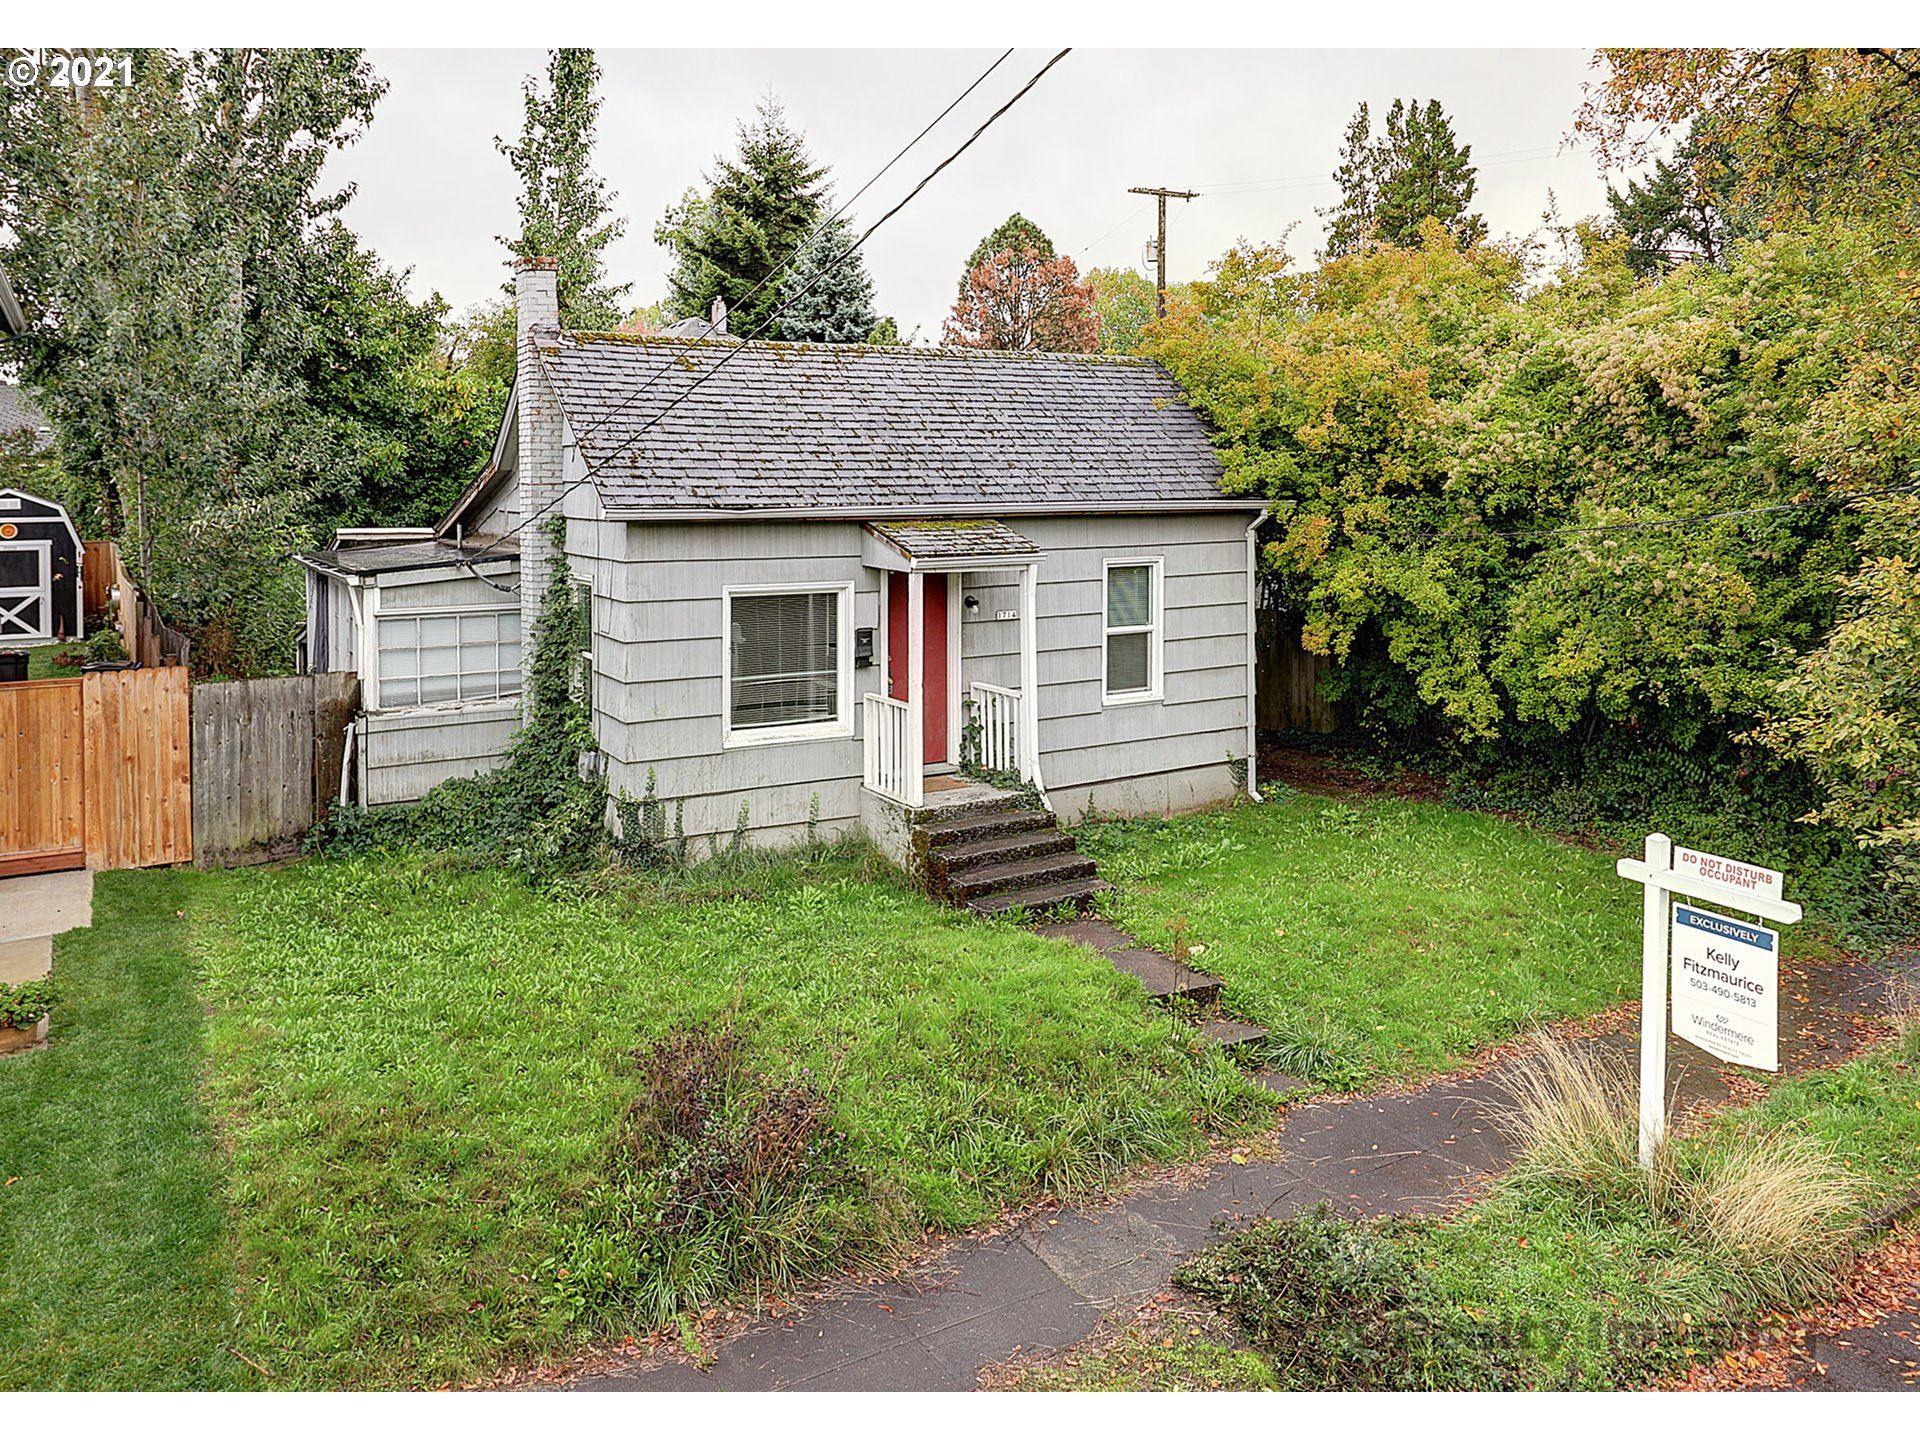 1714 NE BRYANT ST, Portland, OR 97211 - MLS#: 21024931